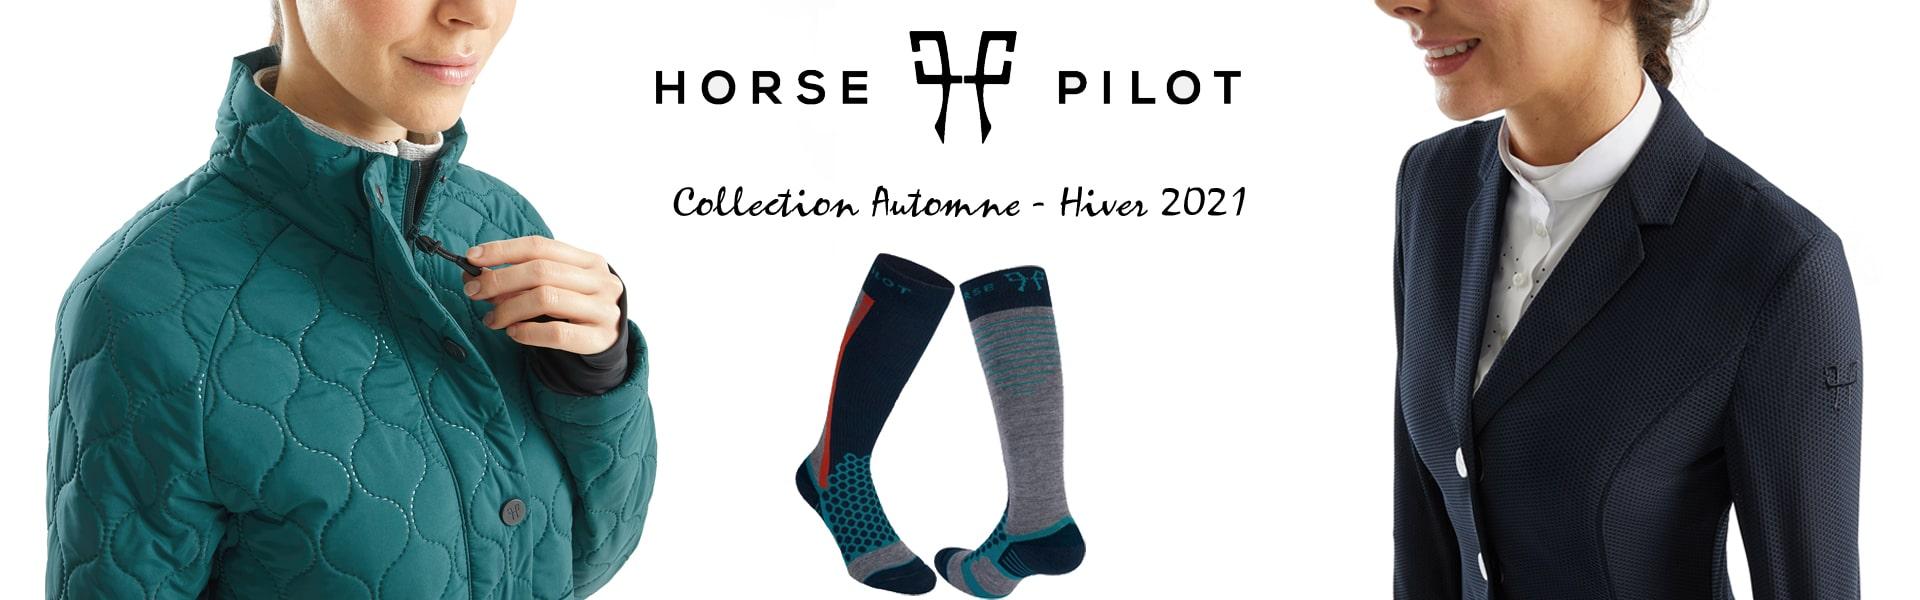 collection Horse Pilot